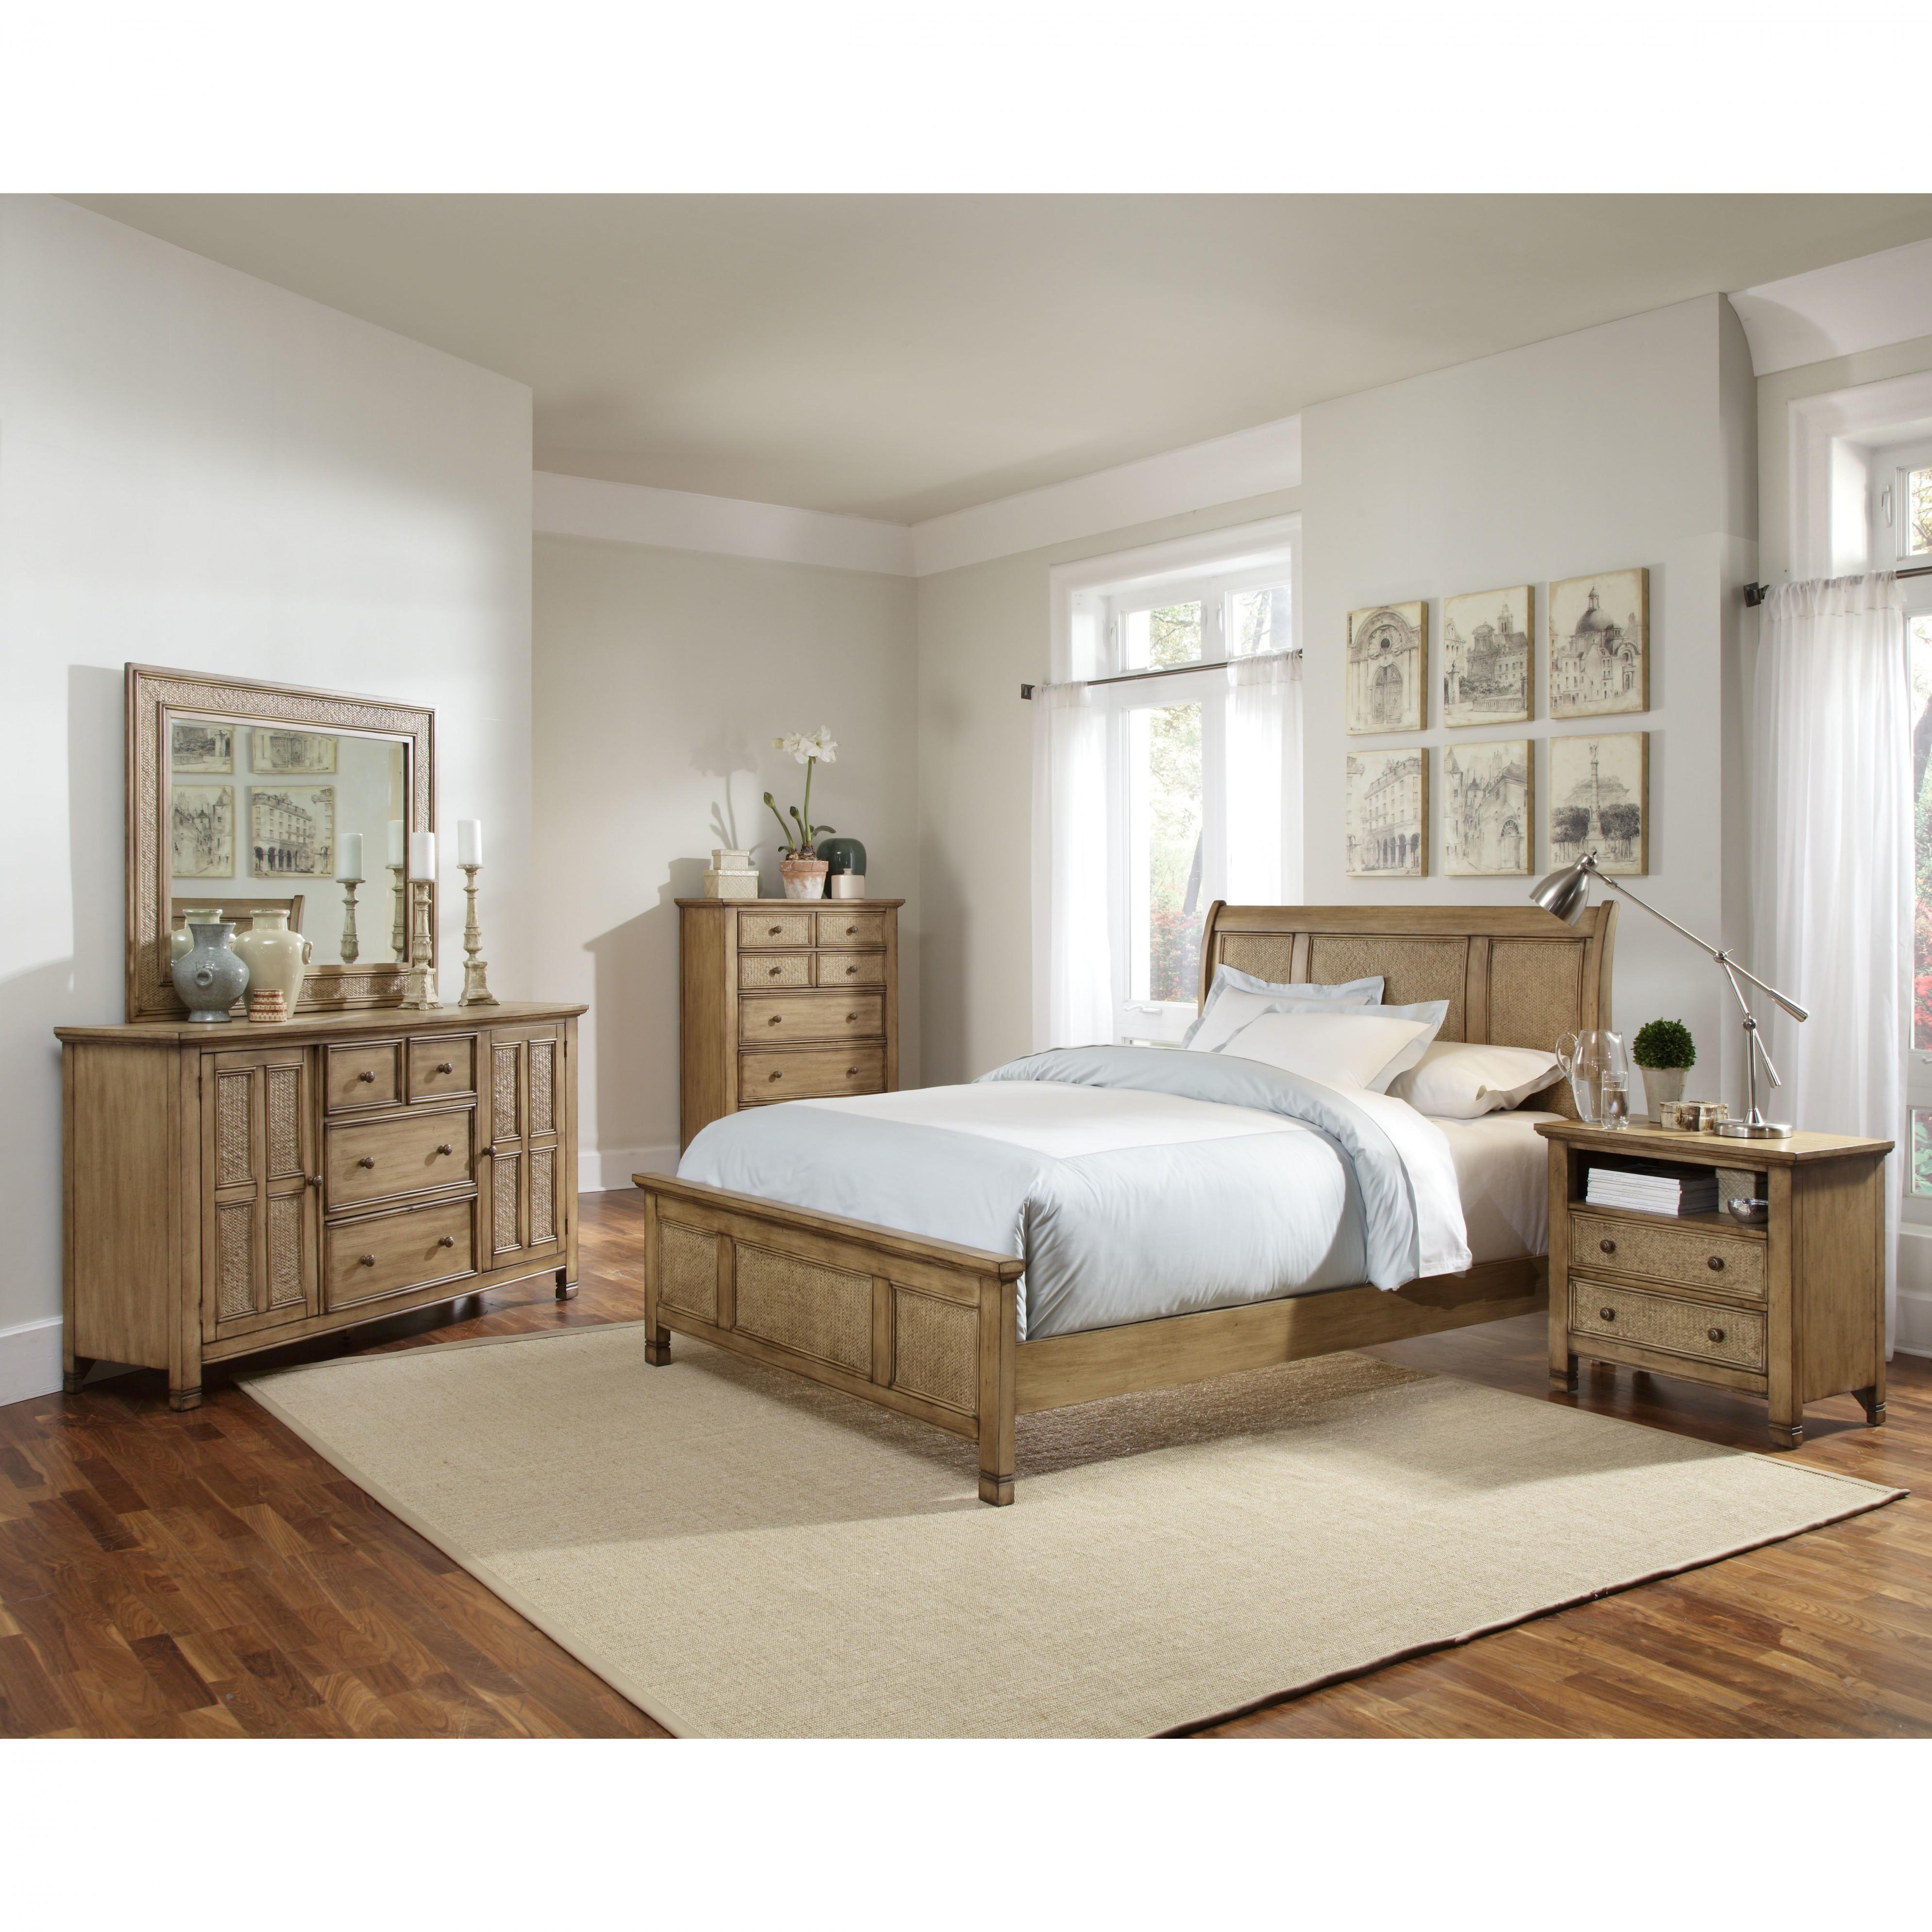 Best ideas about Wayfair Bedroom Sets . Save or Pin Wayfair Bedroom Furniture Sets Now.